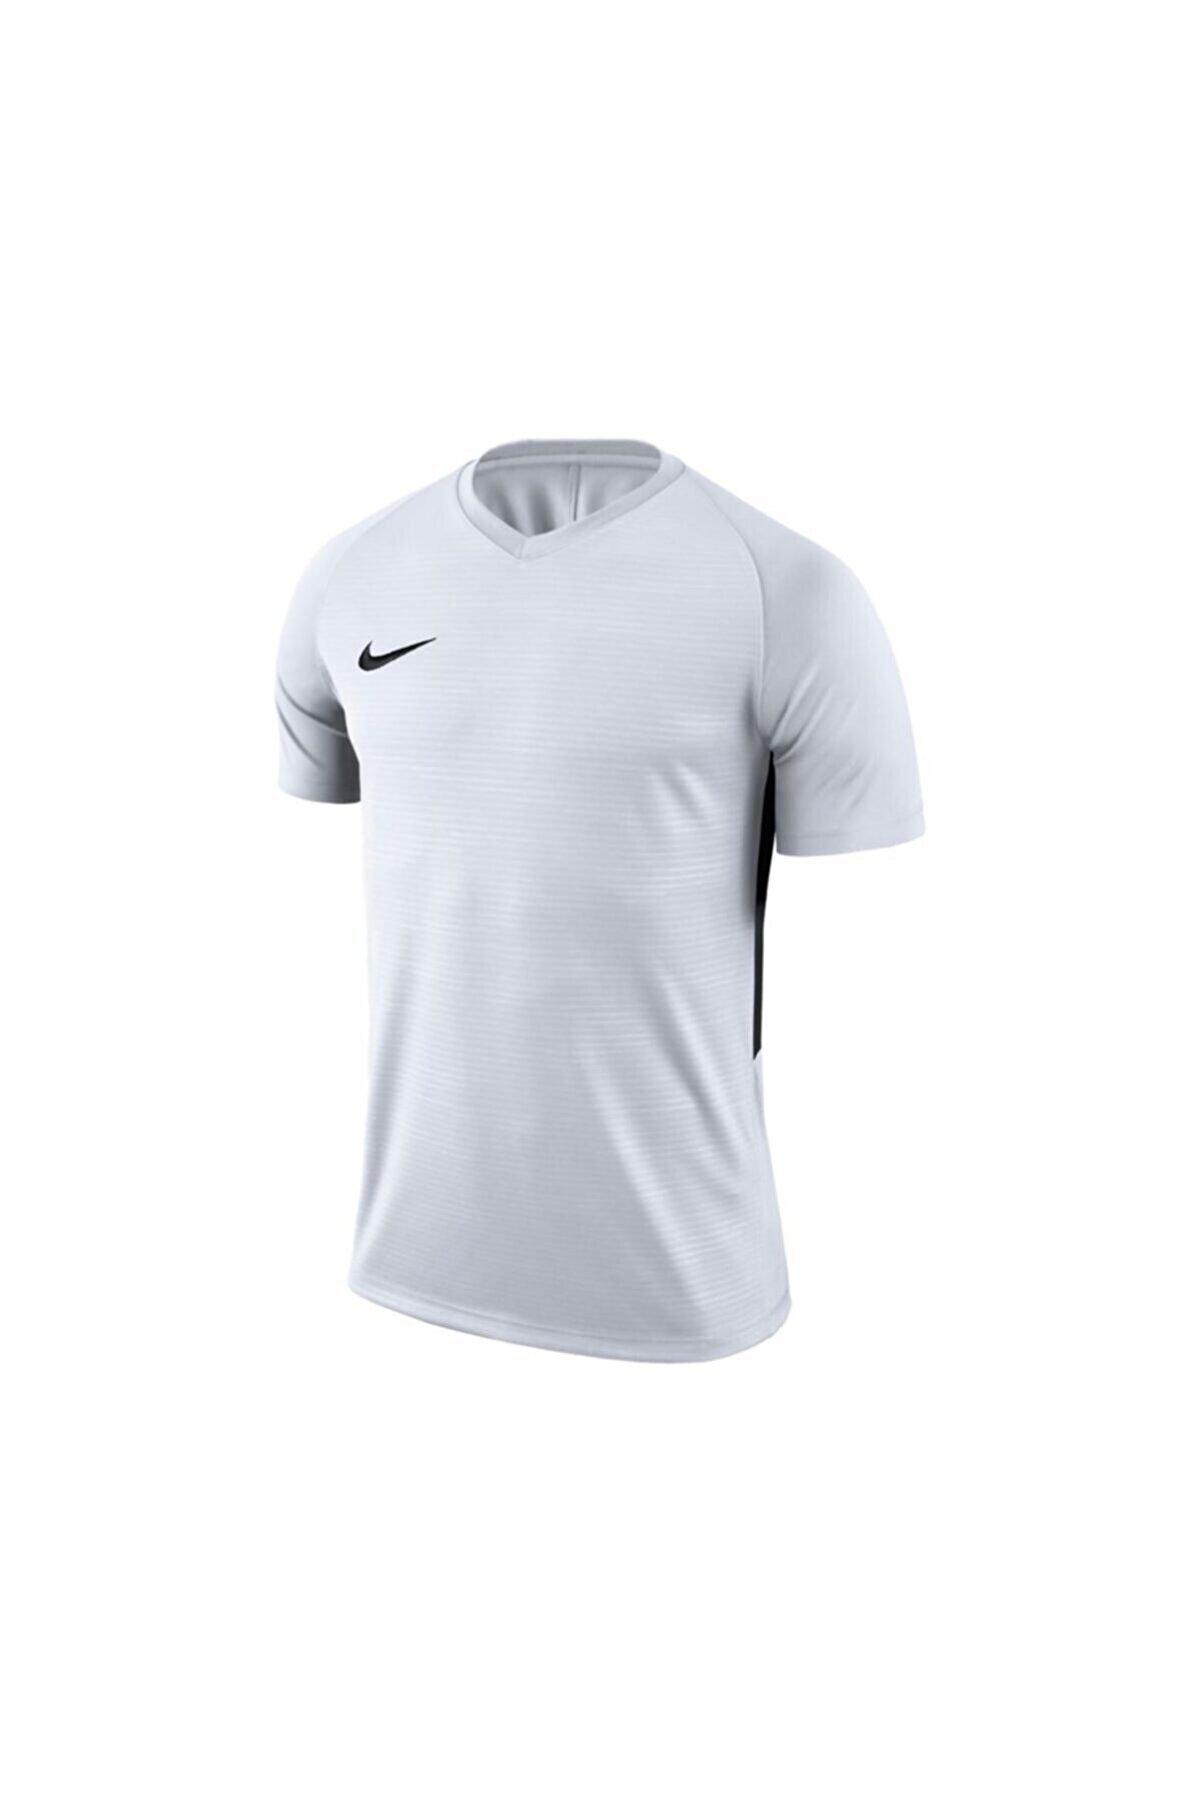 Nike Erkek Beyaz M Nk Dry Tiempo Prem Jsy Ss T-shirt